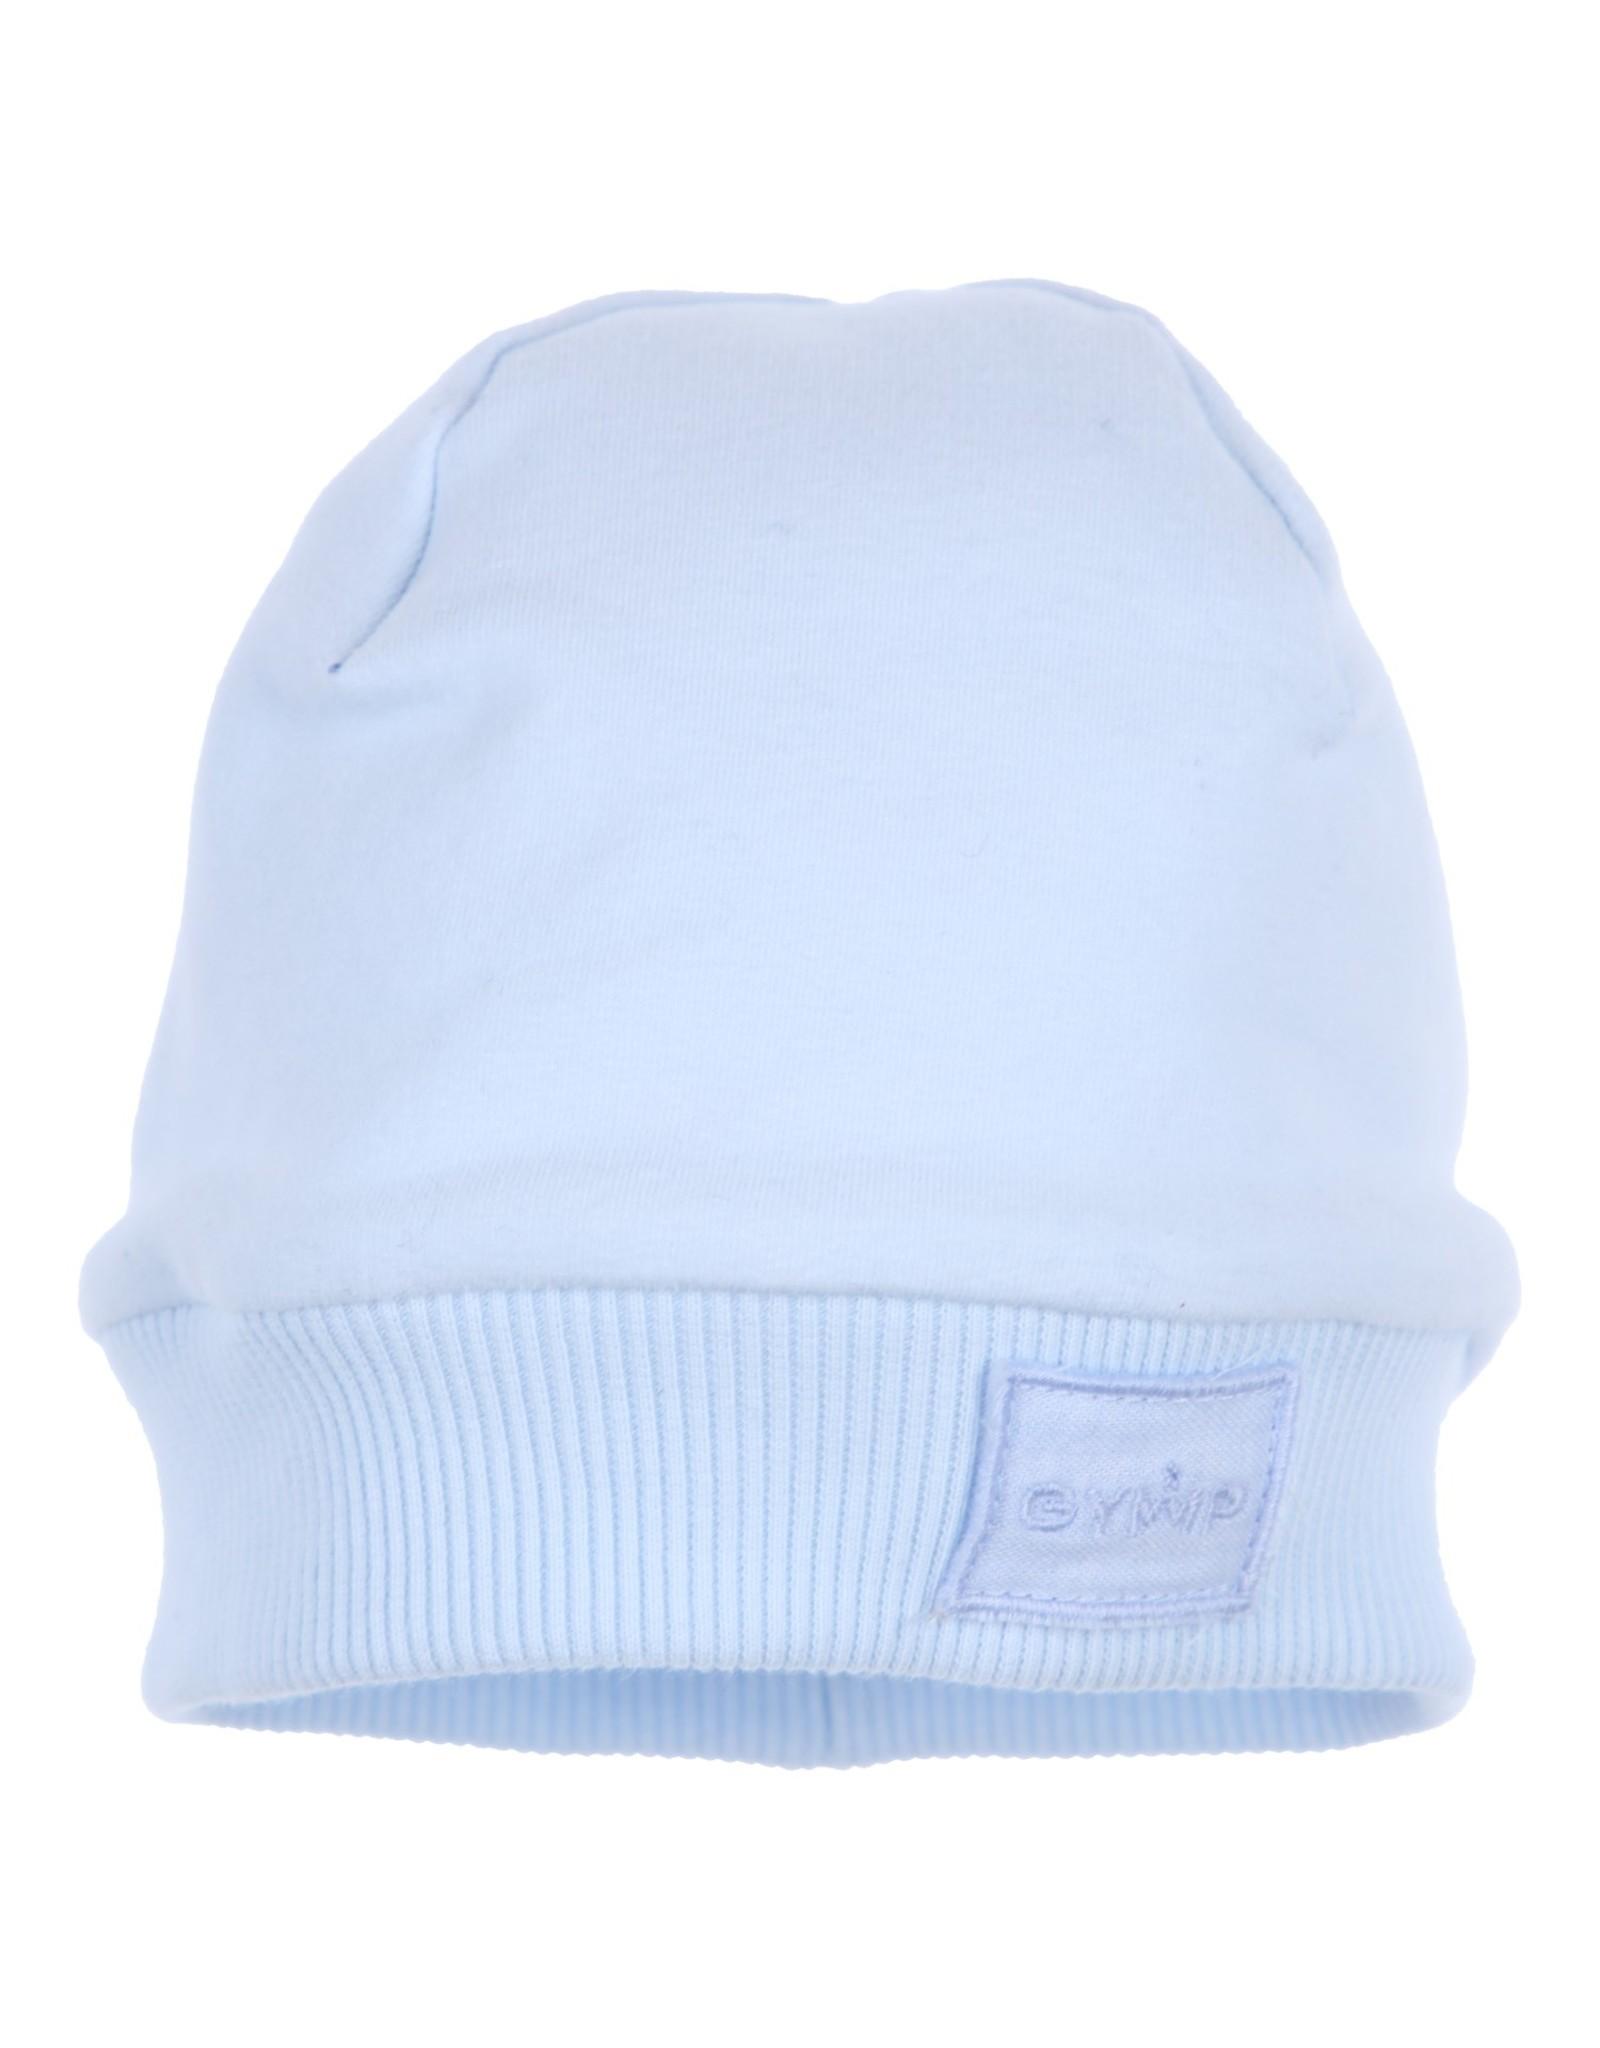 Gymp Muts - Carbondoux - Baby Acces Lichtblauw